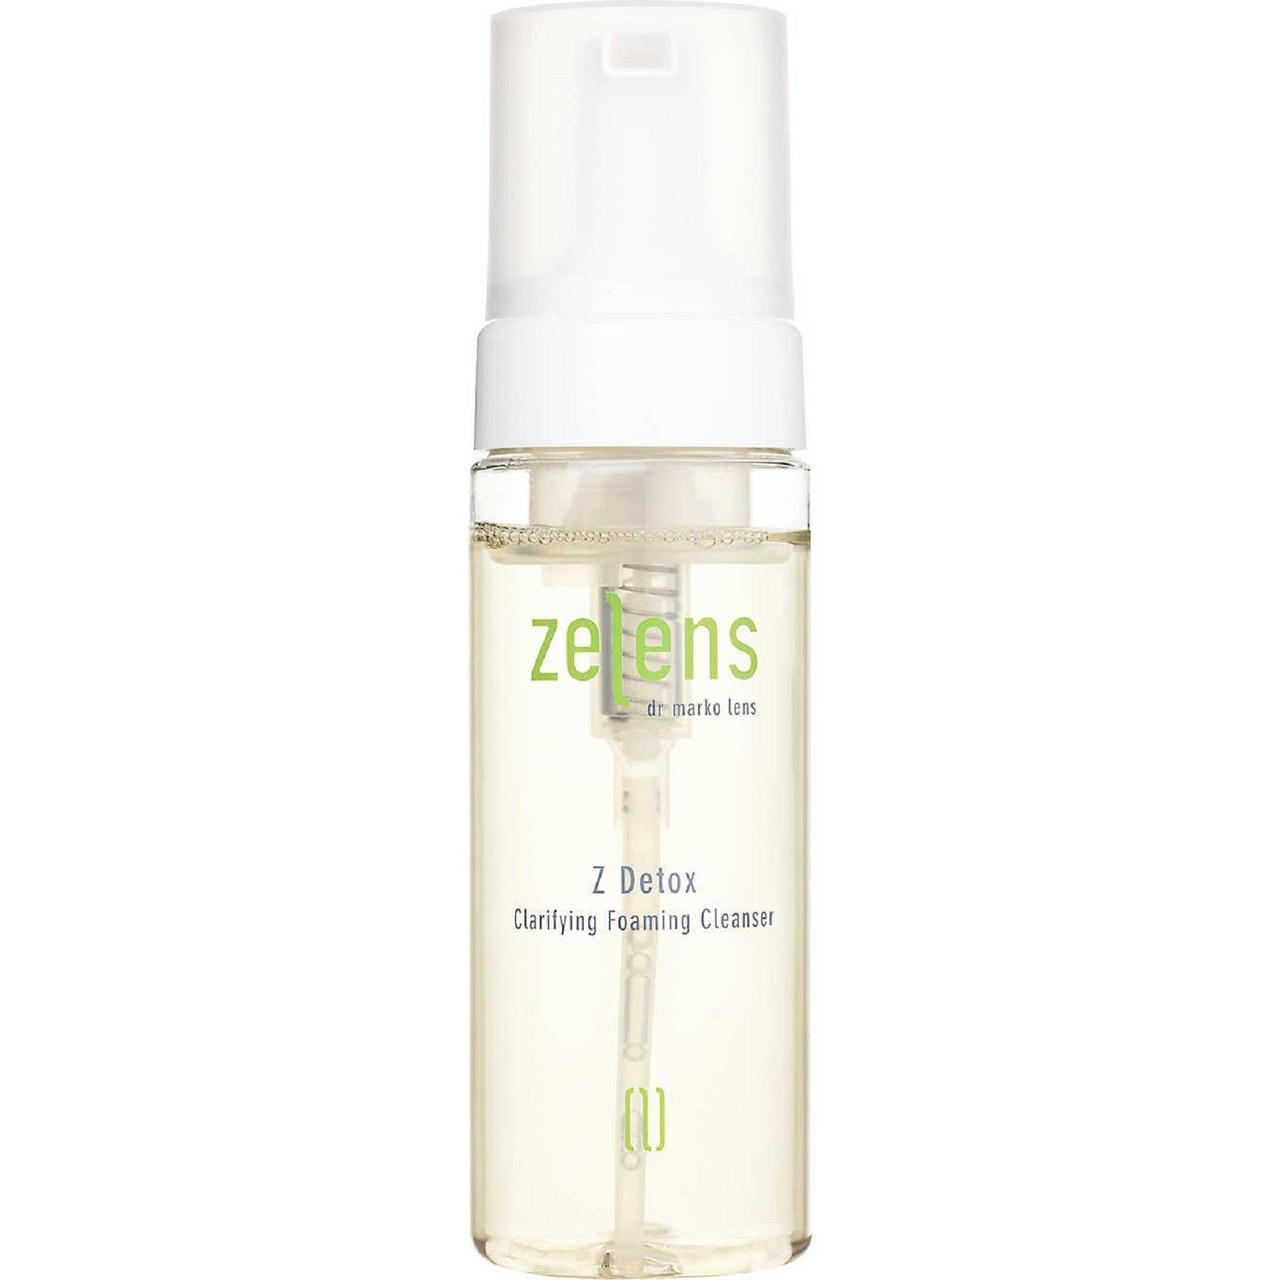 An image of Zelens Z Detox Clarifying Foaming Cleanser